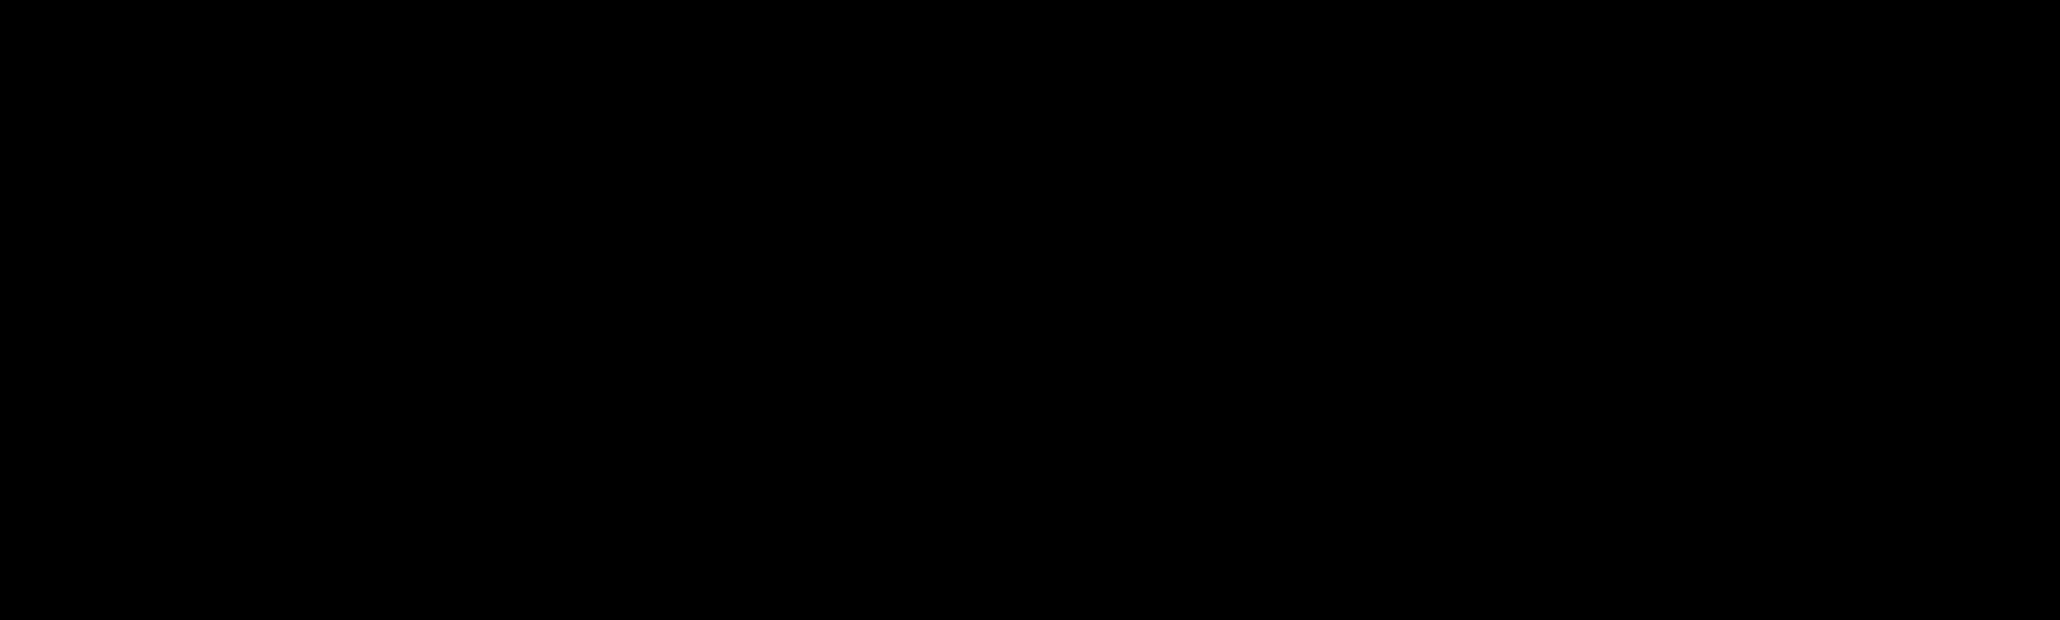 (R)-tert-Butyl 5-amino-1-(4-((2-amino-9H-purin-6-yloxy)methyl)benzylamino)-1-oxopentan-2-ylcarbamate